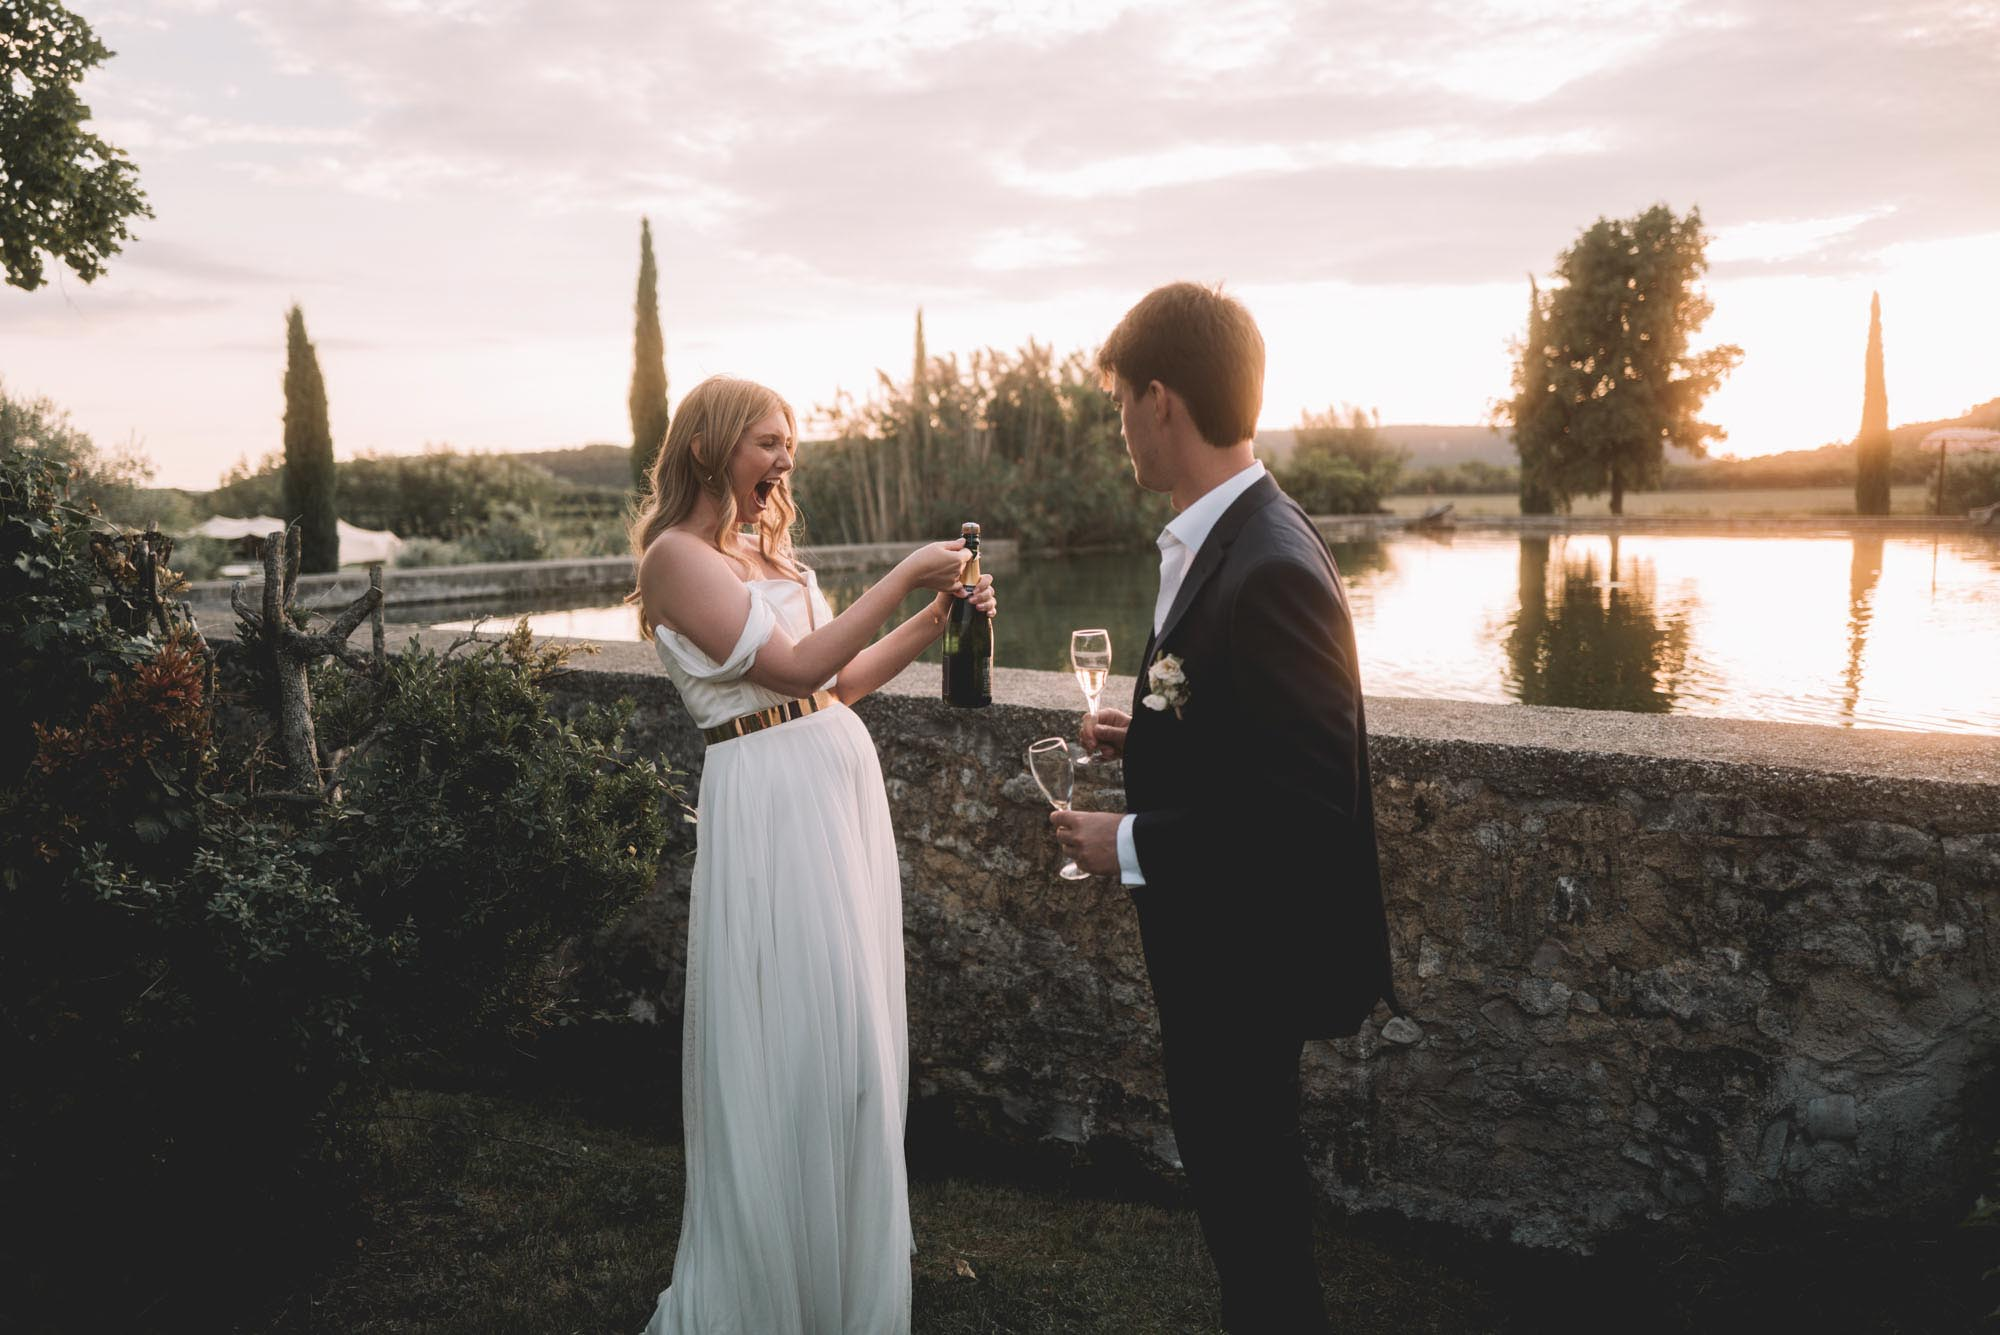 KATHARINA + DIMITRI_DOMAINES DE PATRAS_PHOTOGRAPHE MARIAGE_LES BANDITS-7